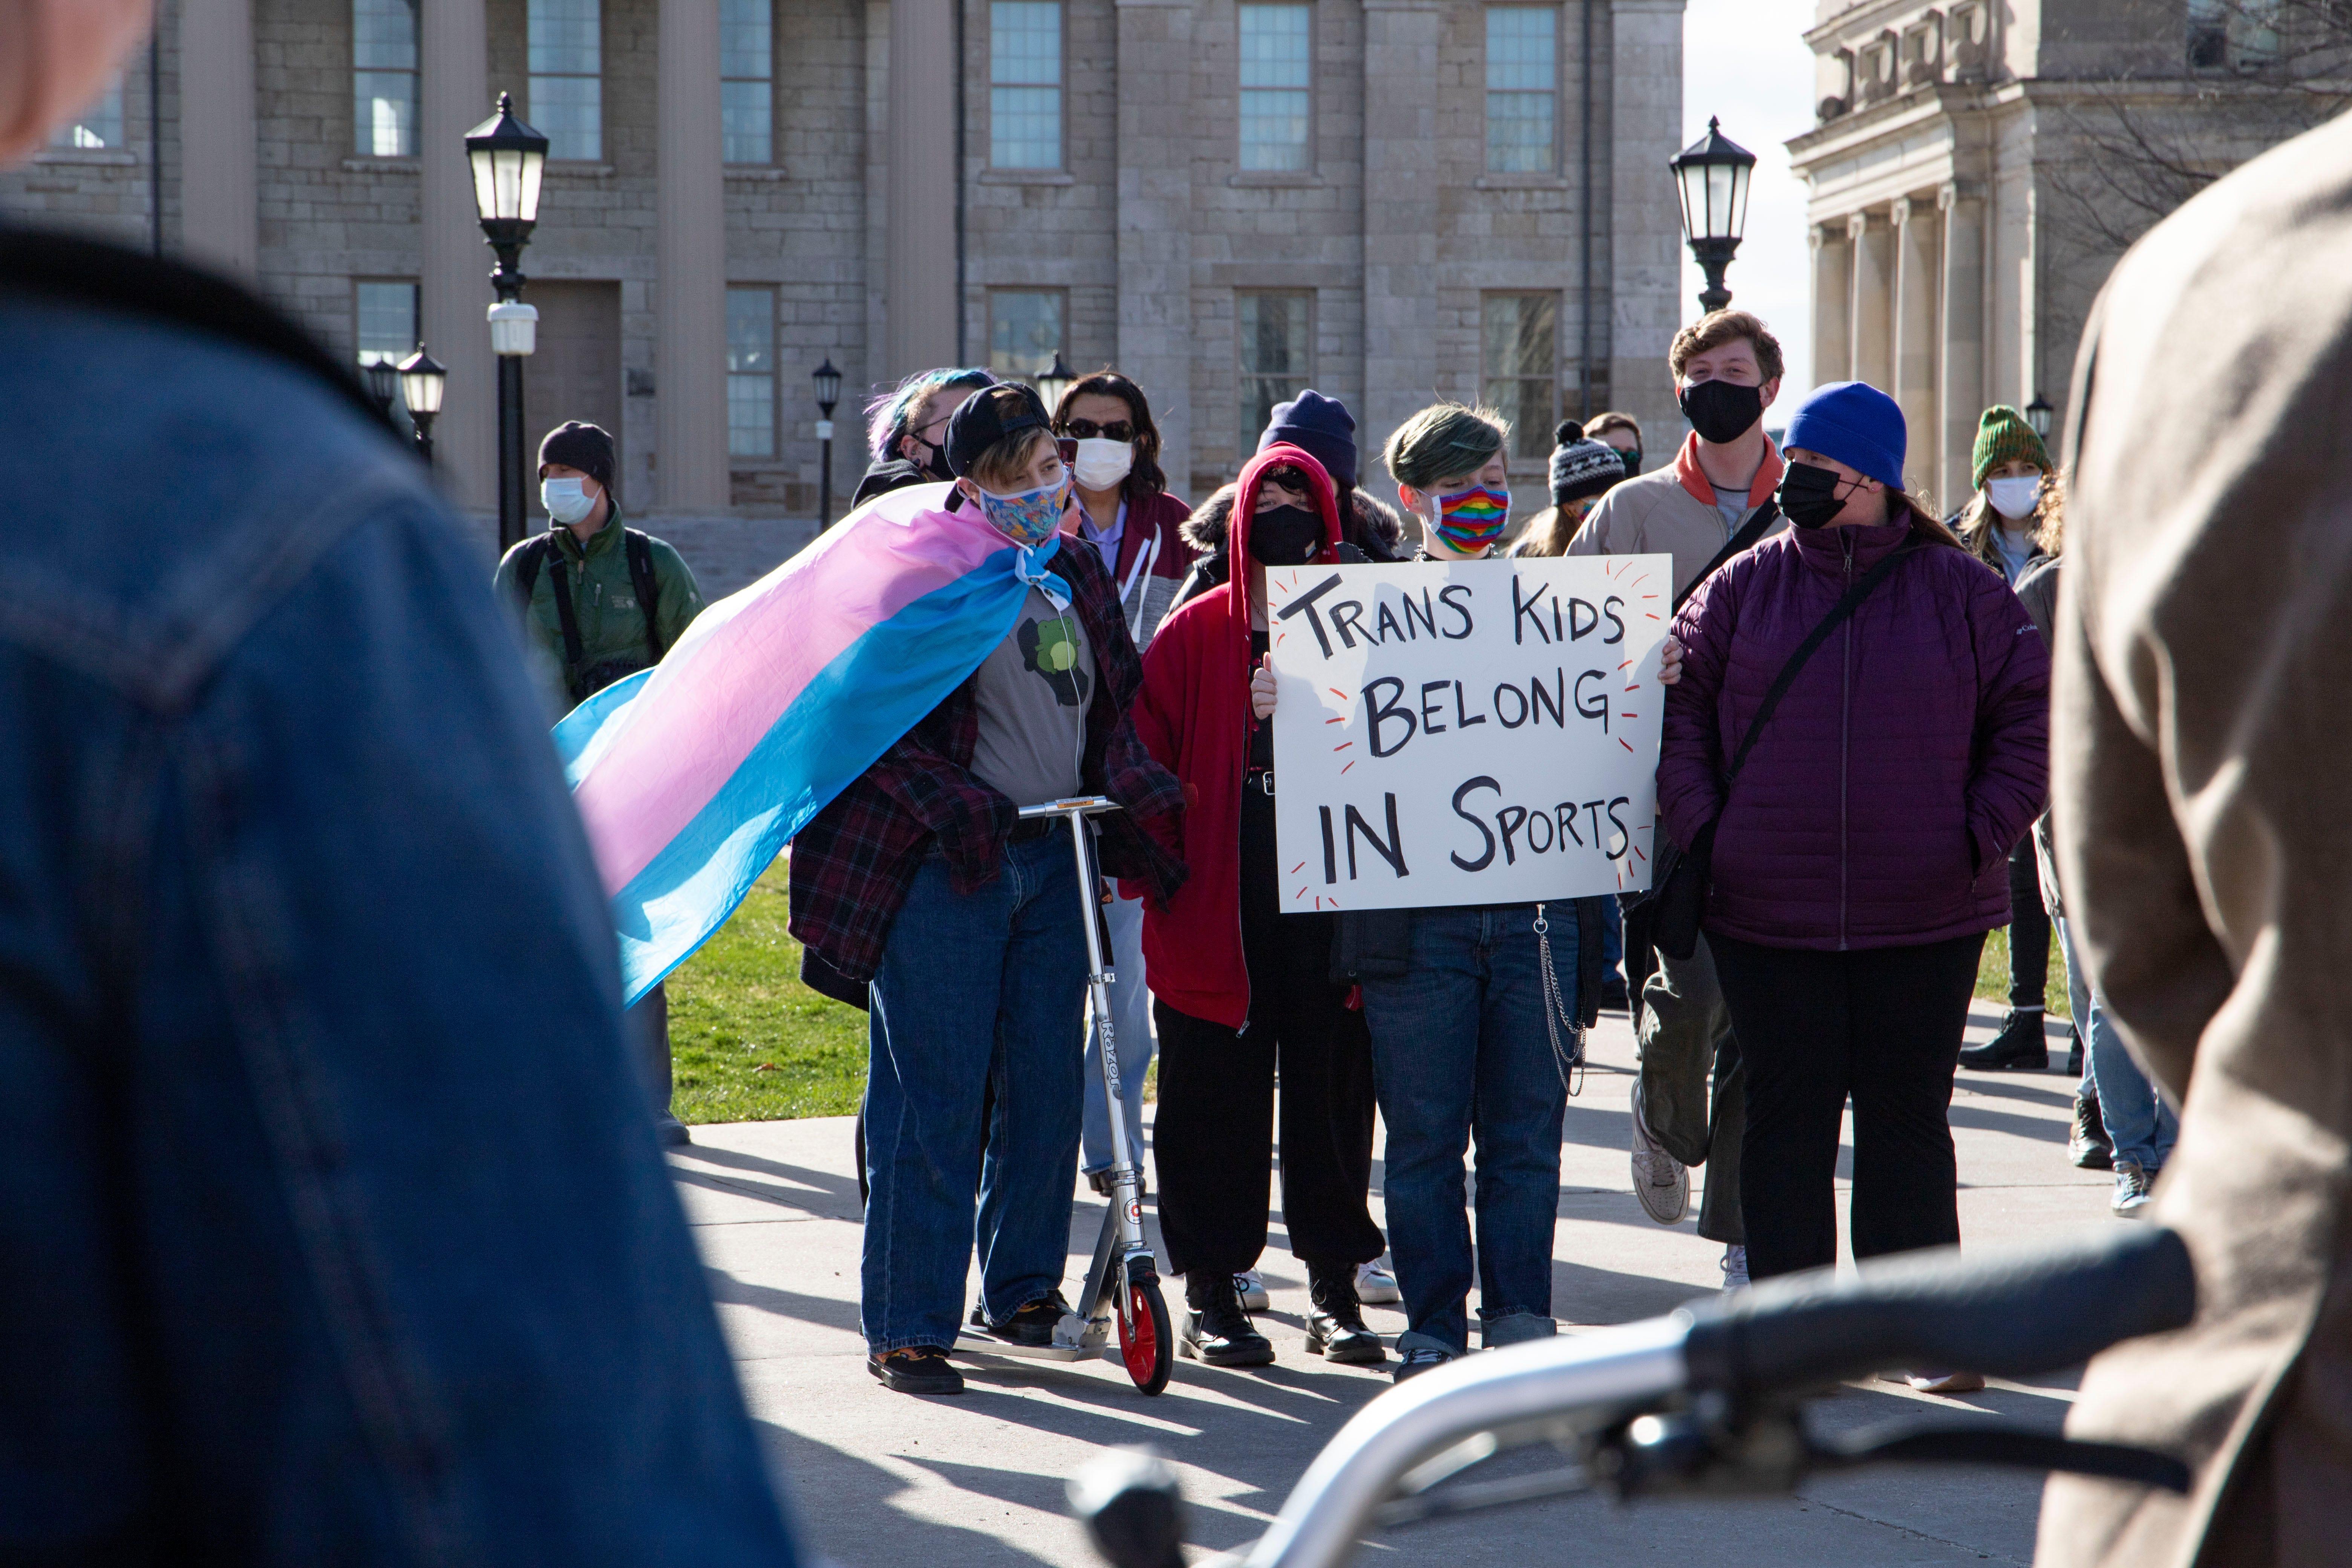 Florida Legislature passes bill banning transgender women and girls from female sports teams 2